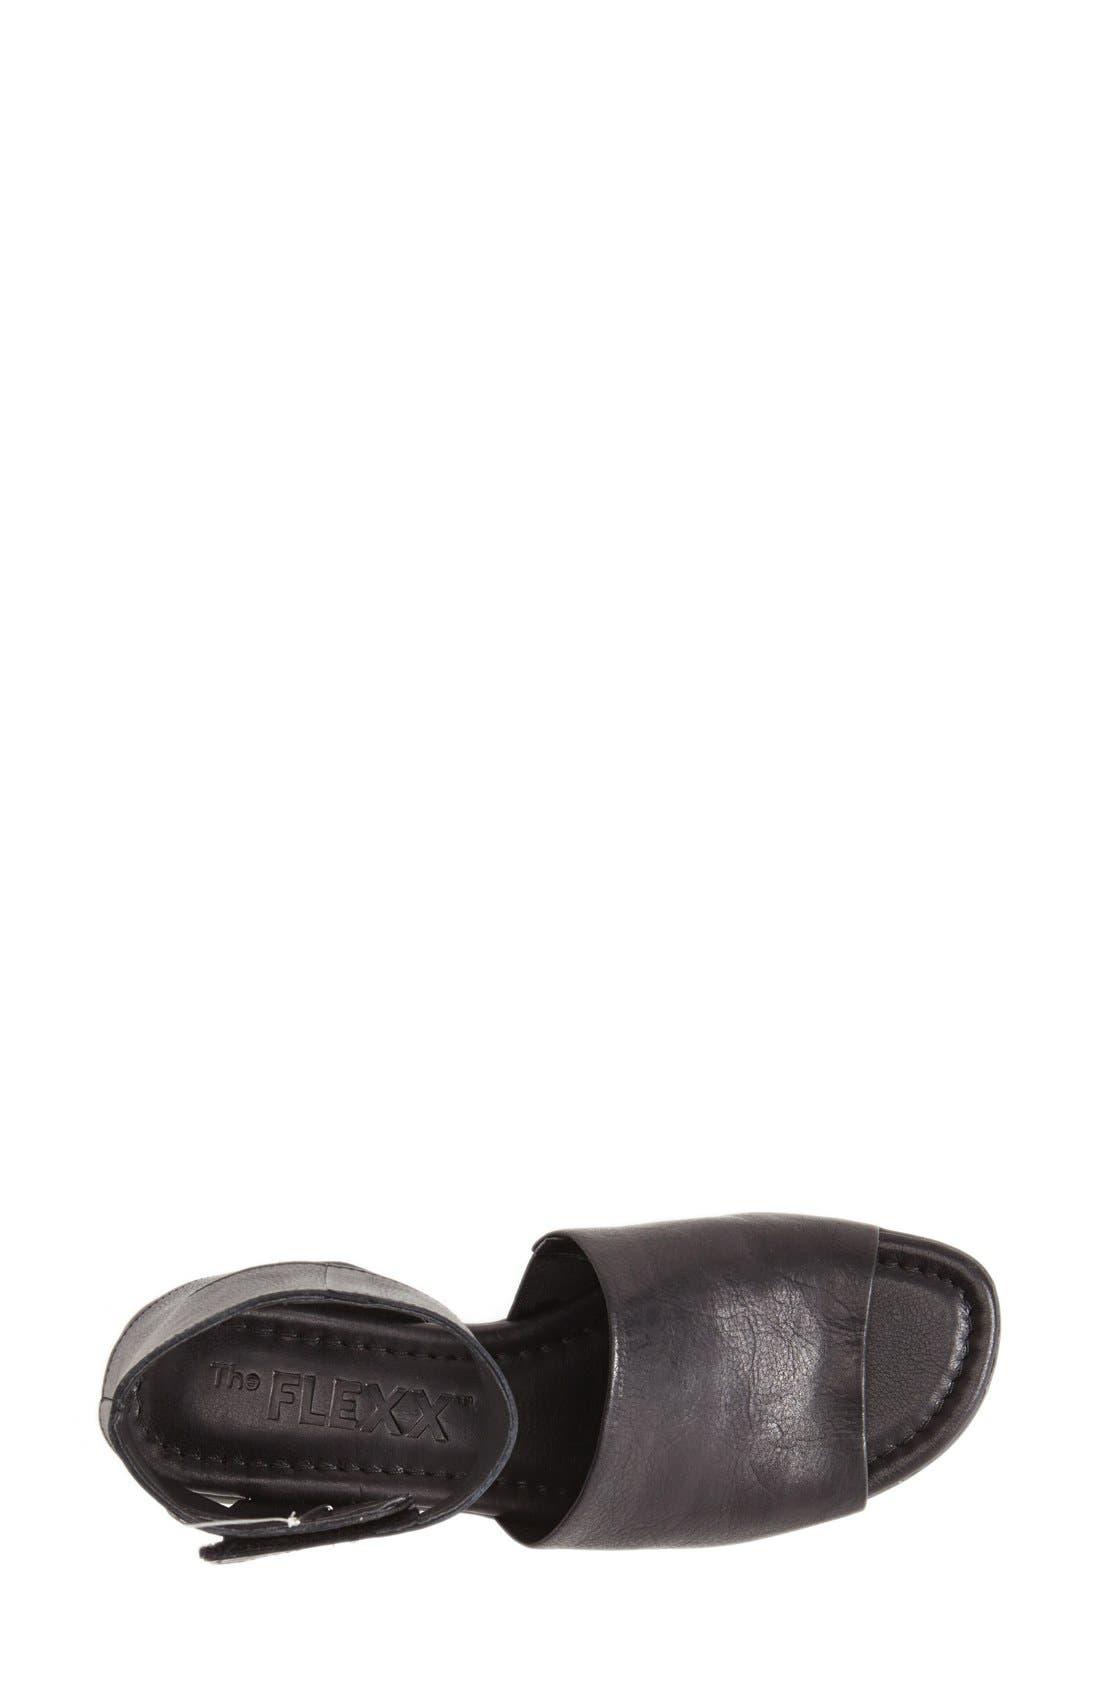 Alternate Image 3  - The FLEXX 'Beglad' Leather Ankle Strap Sandal